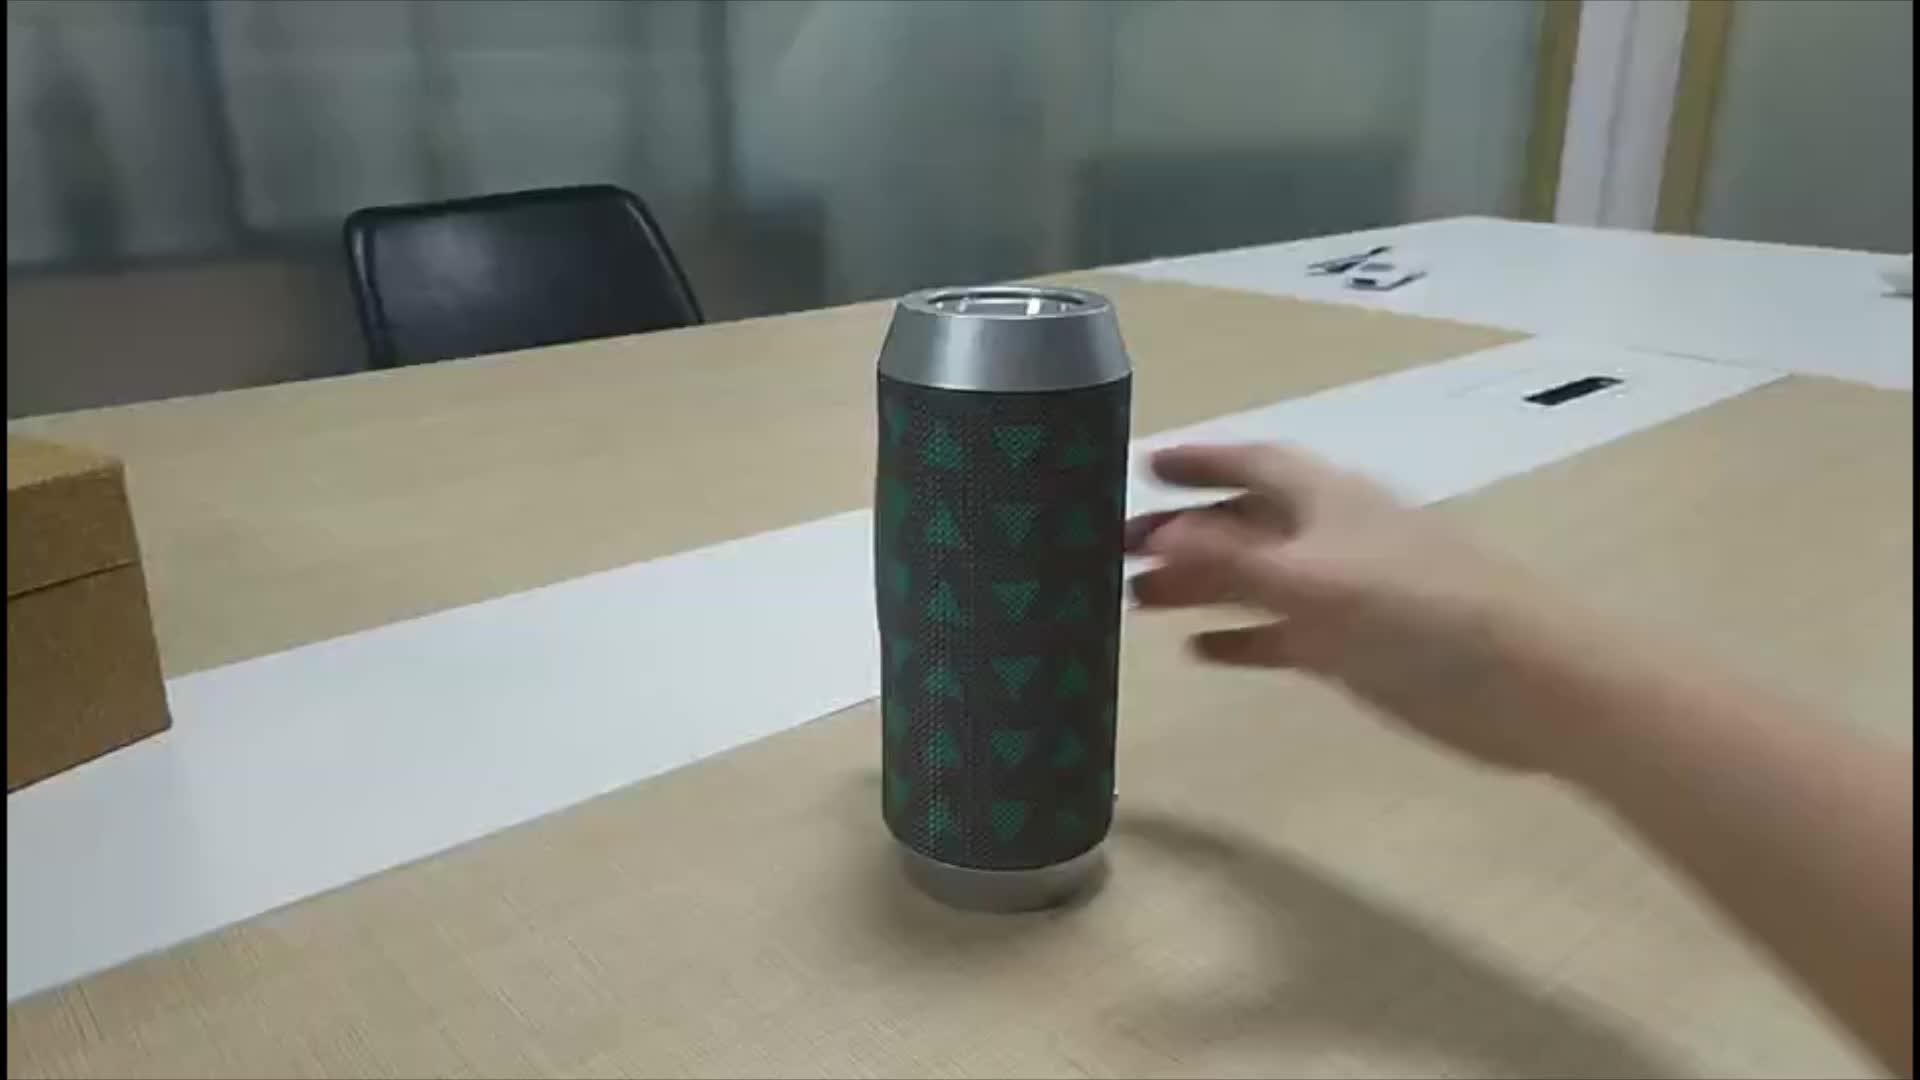 Shenzhen portable home wireless usb stereo speaker with fm